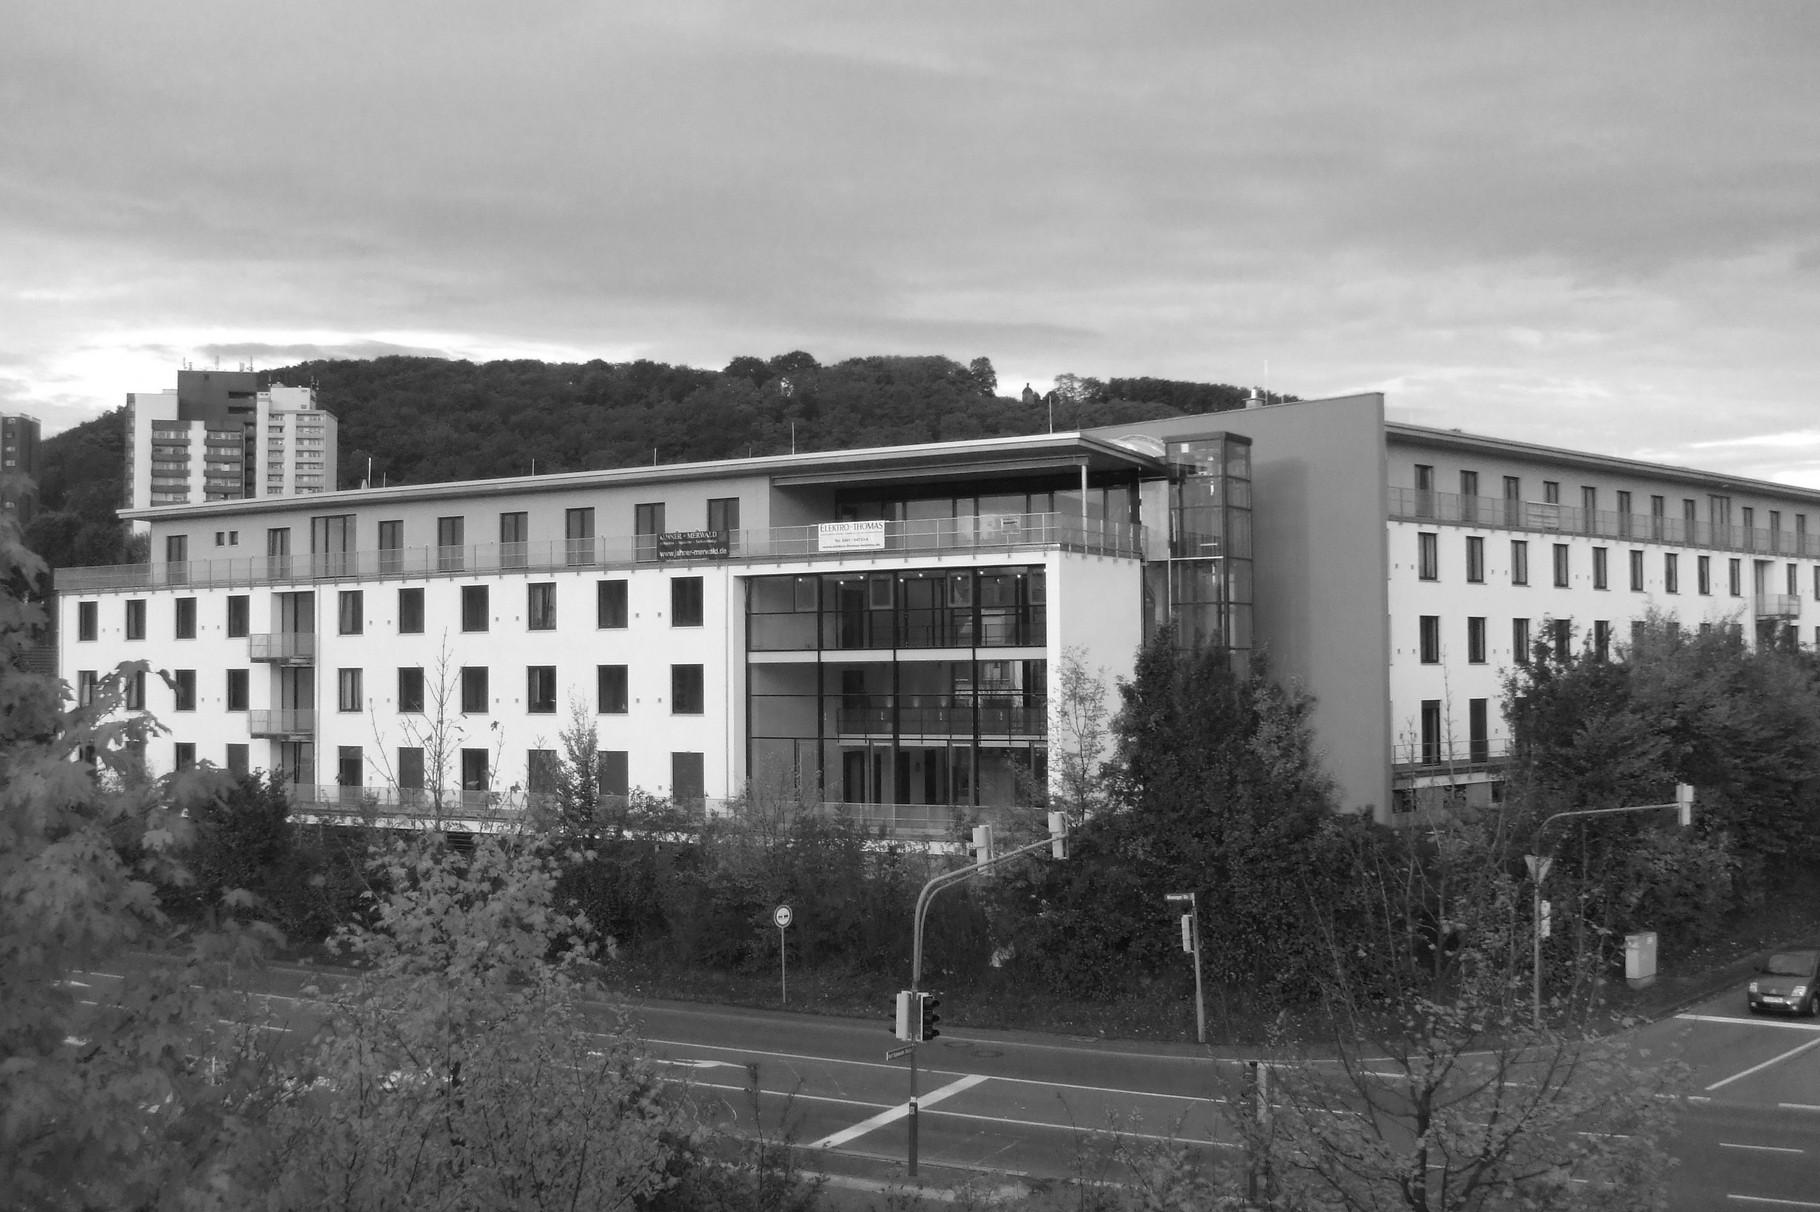 Neubau Studentenwohnheim Koblenz